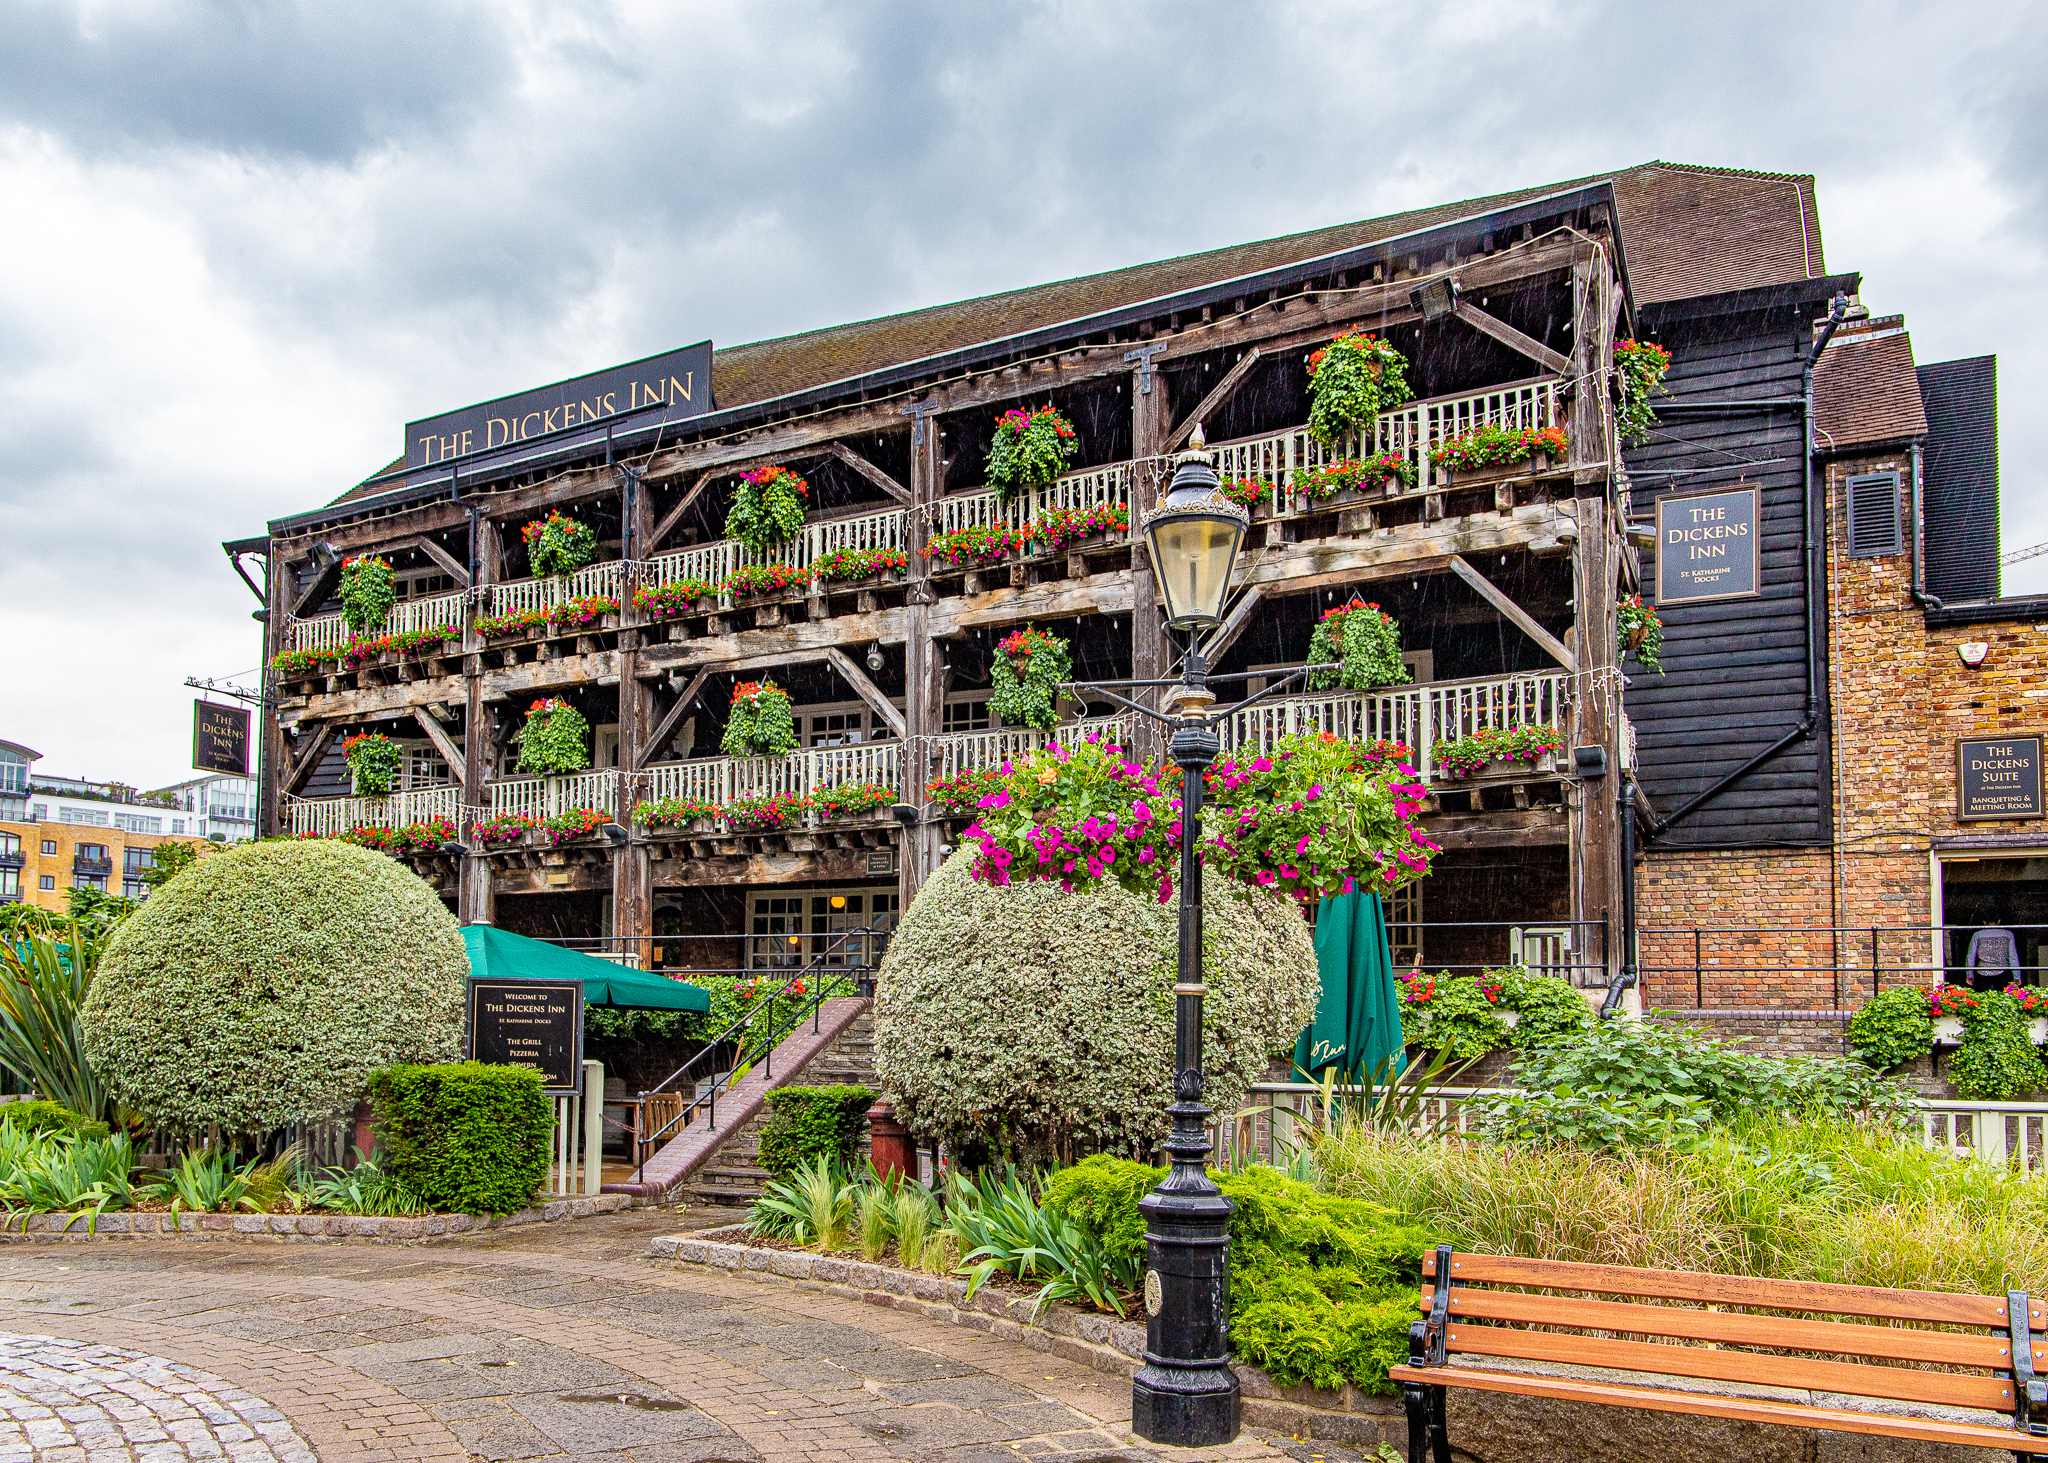 The Dickens Inn at Saint Katharine Docks